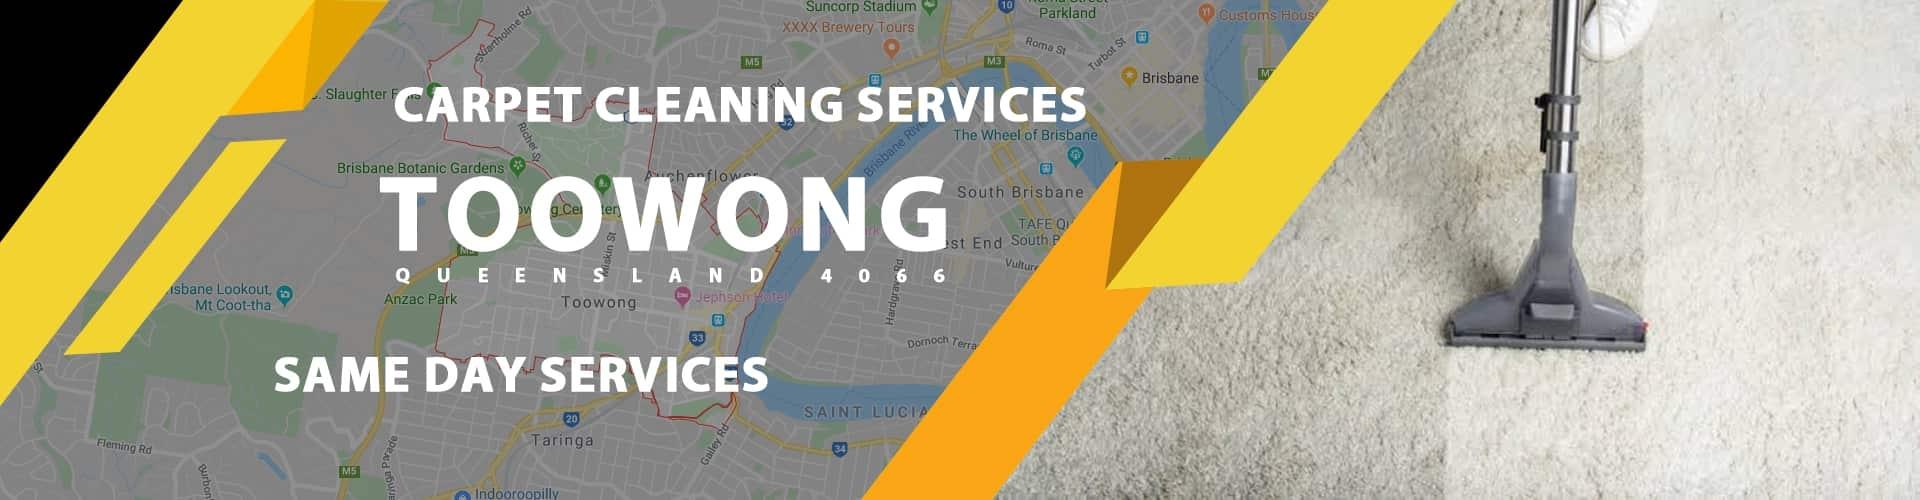 Carpet Cleaning Toowong (@carpetcleaningtoowong) Cover Image